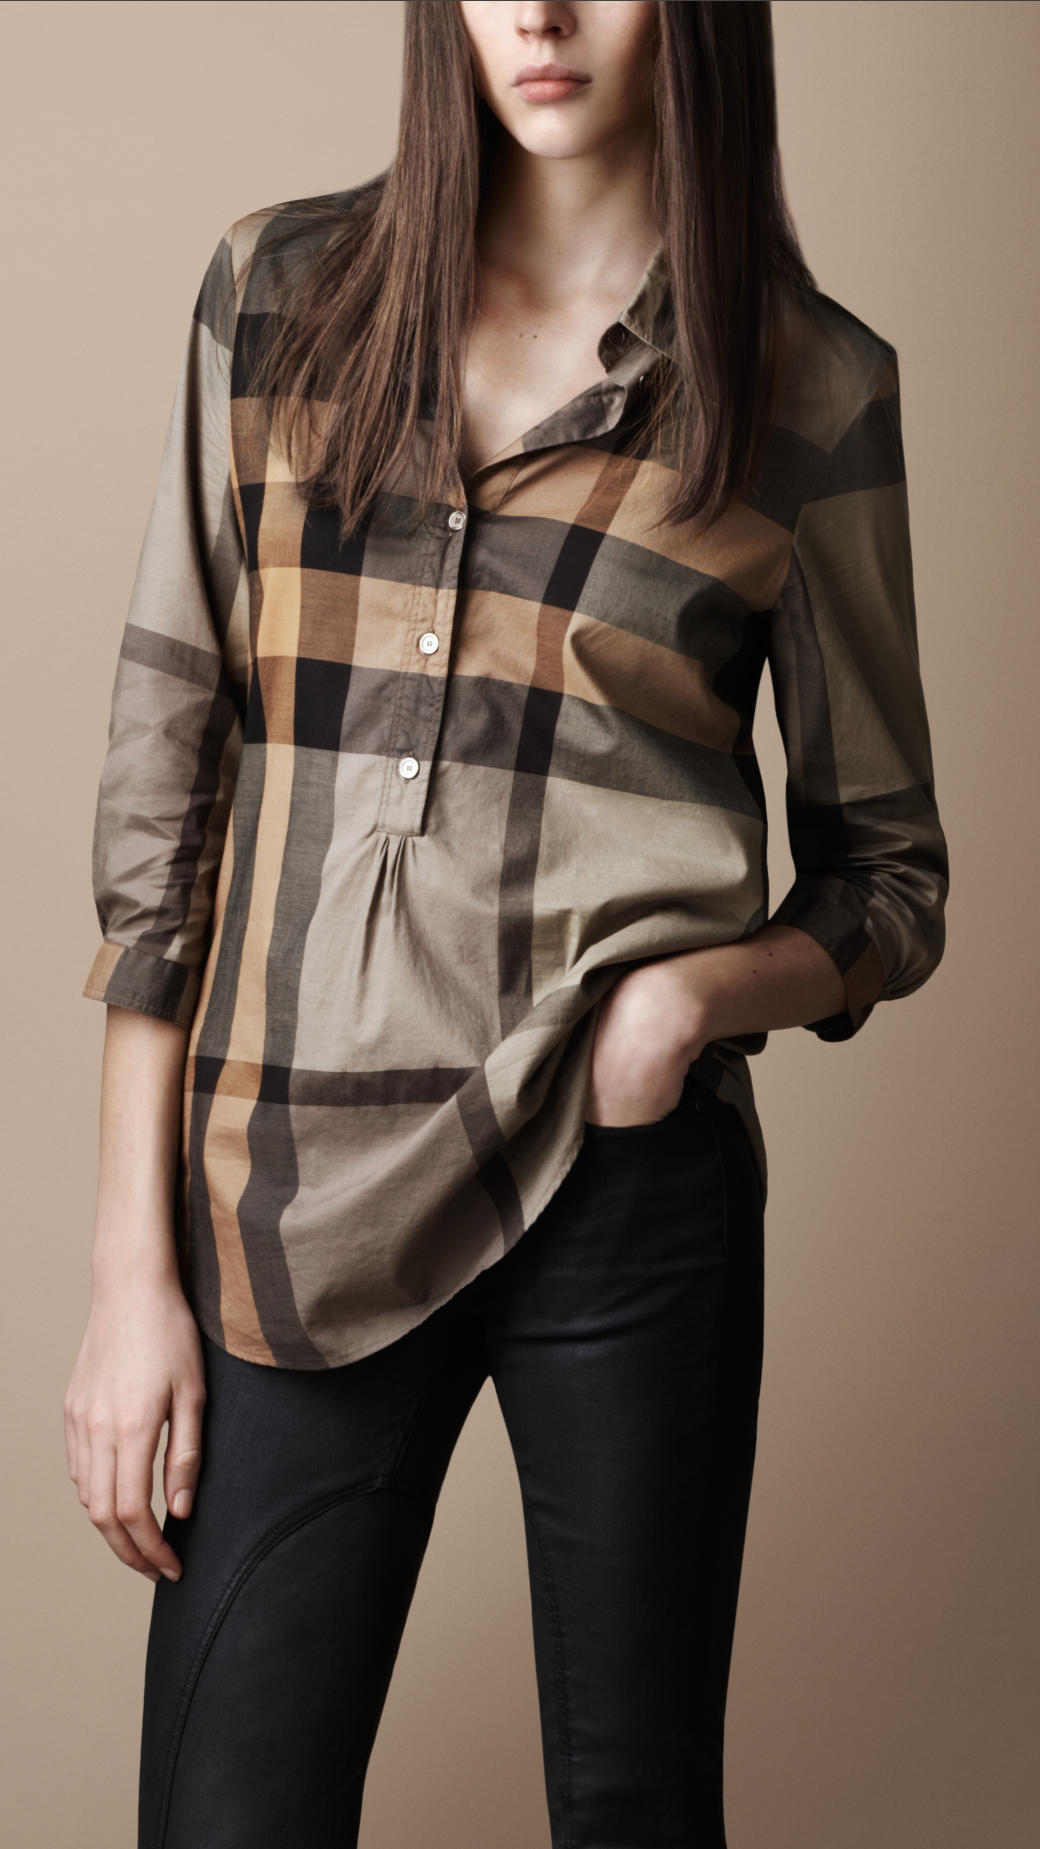 d3257b2db7d Burberry Brit Check Tunic Shirt in Natural - Lyst